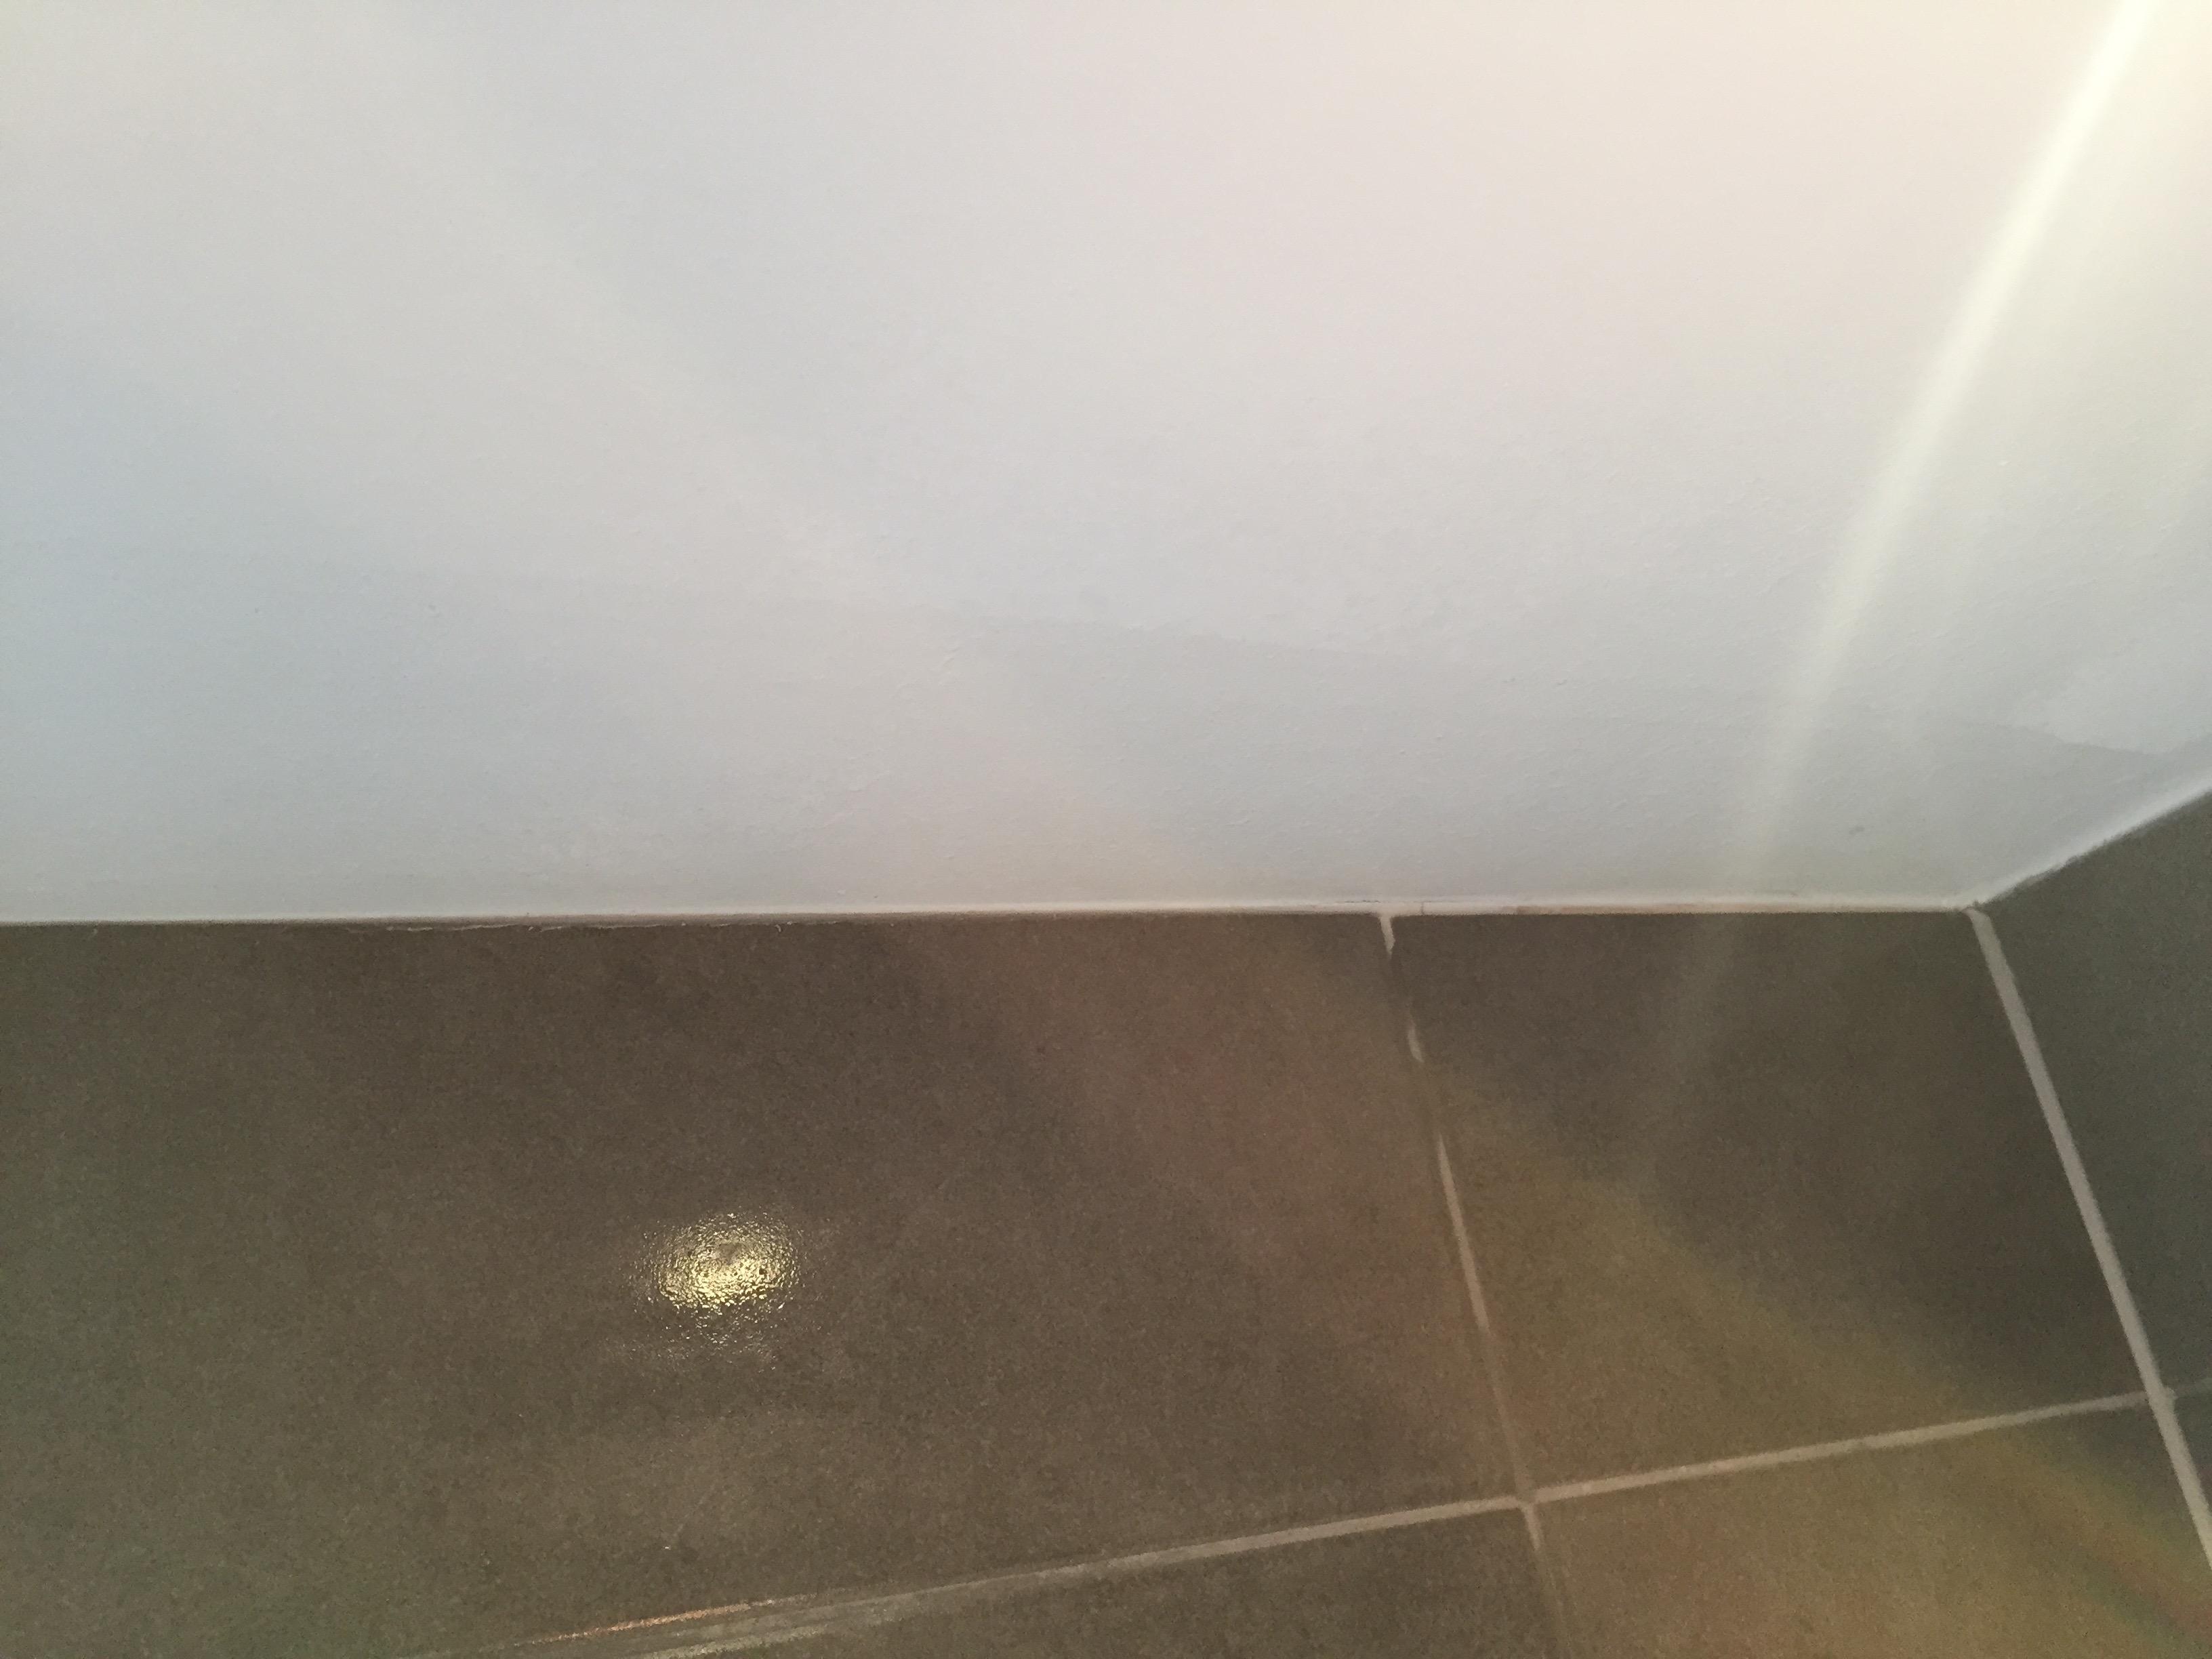 Stunning Schimmel Badkamer Verwijderen Plafond Pictures - House ...